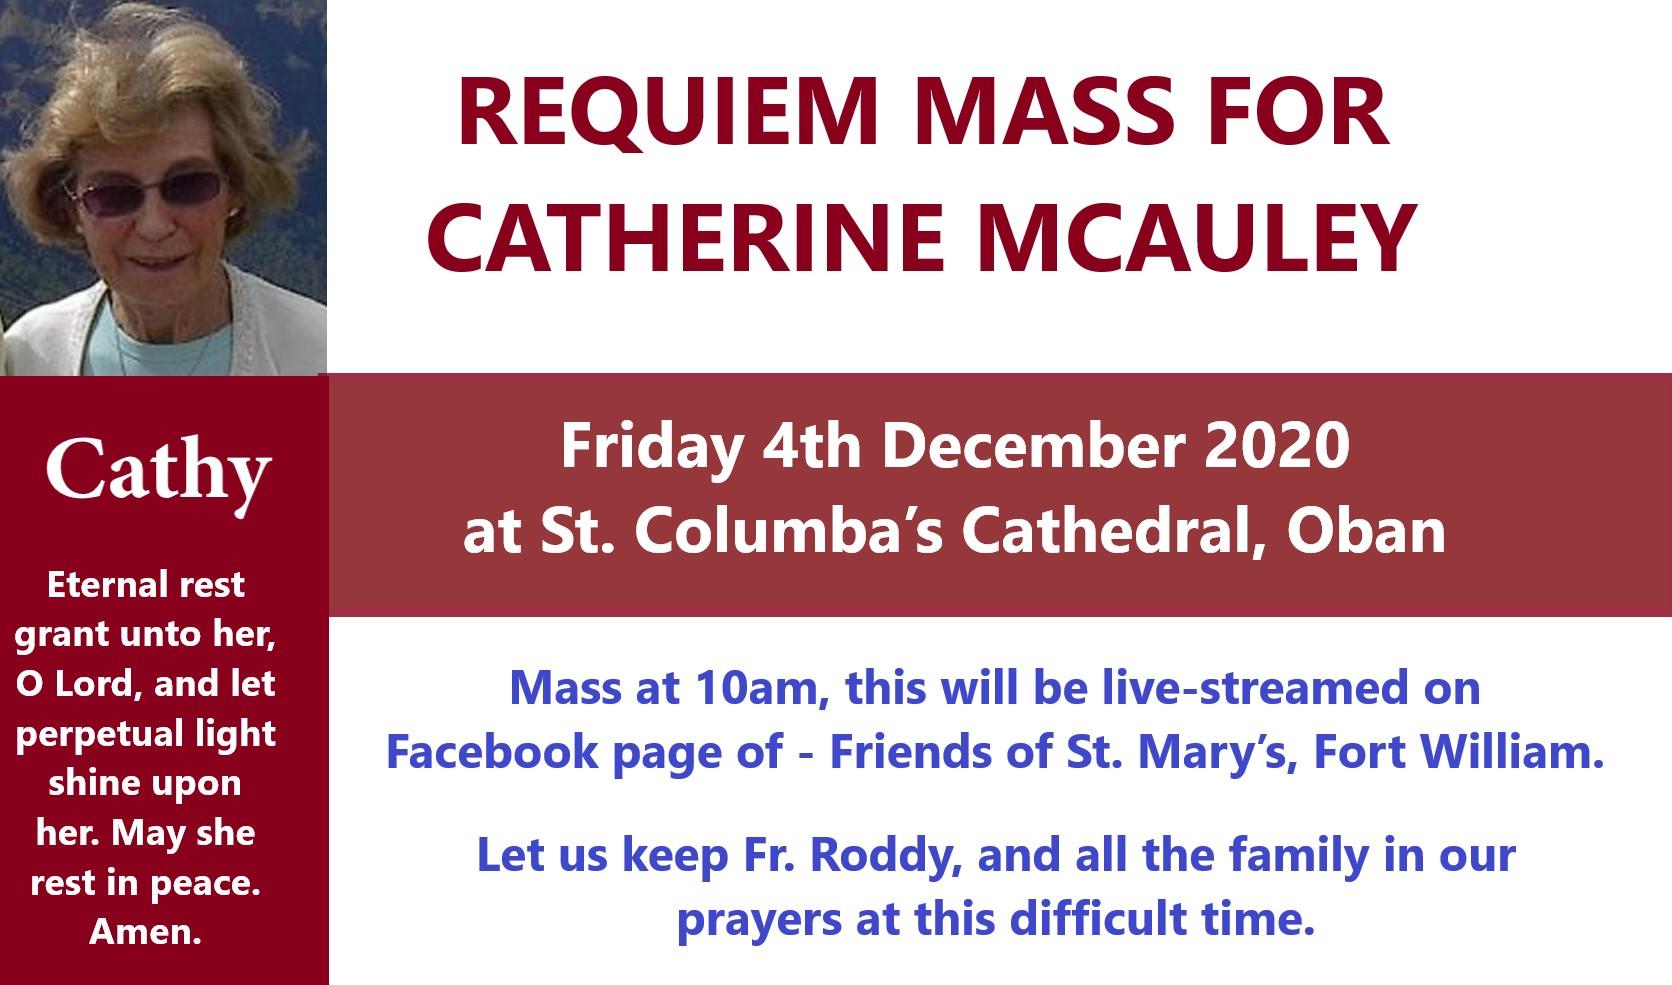 Requiem Mass for Cathy McAuley RIP